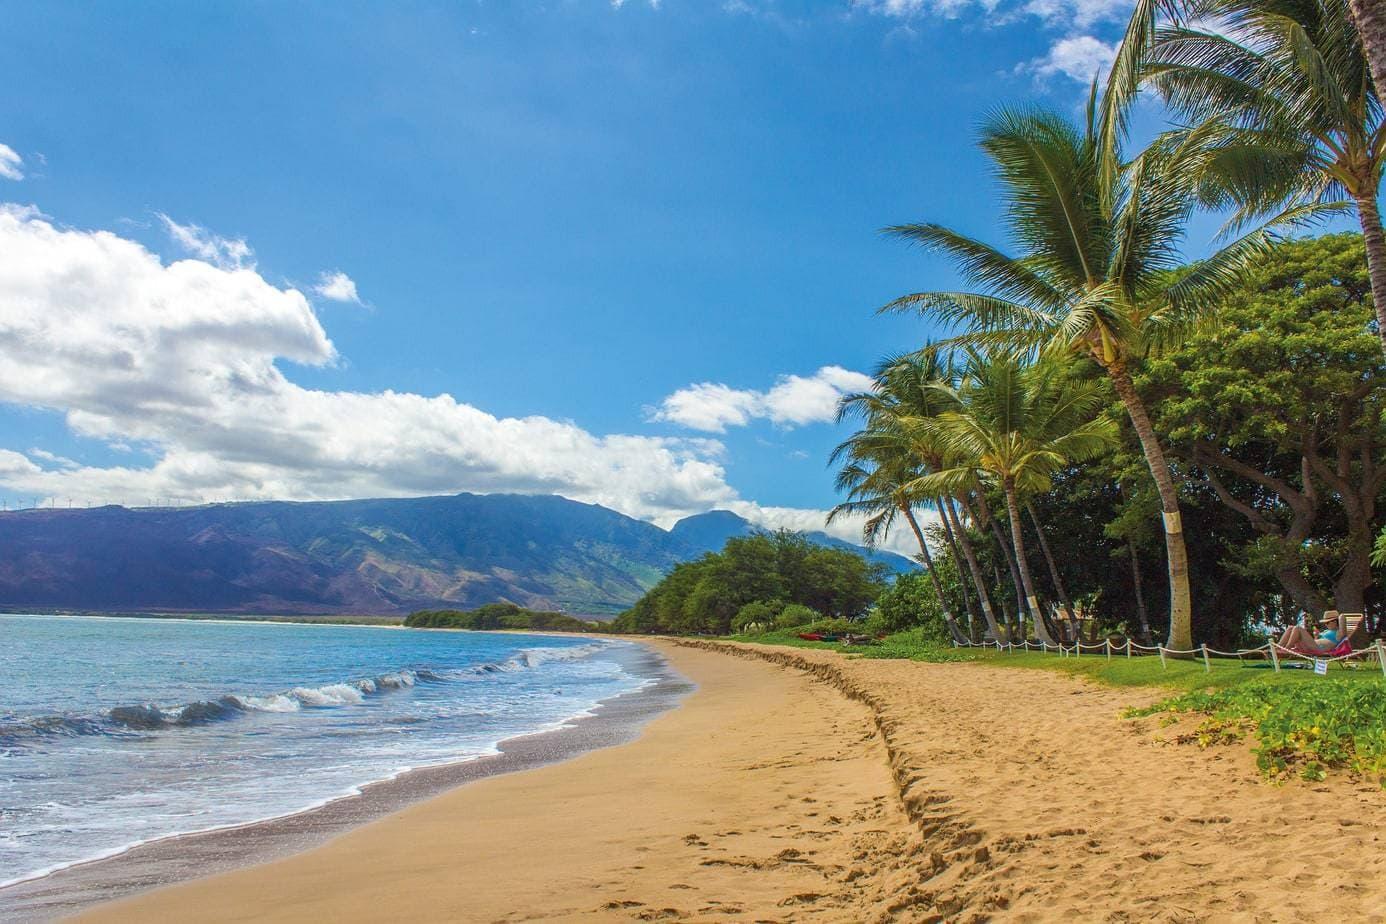 Hawaii beach in broad daylight